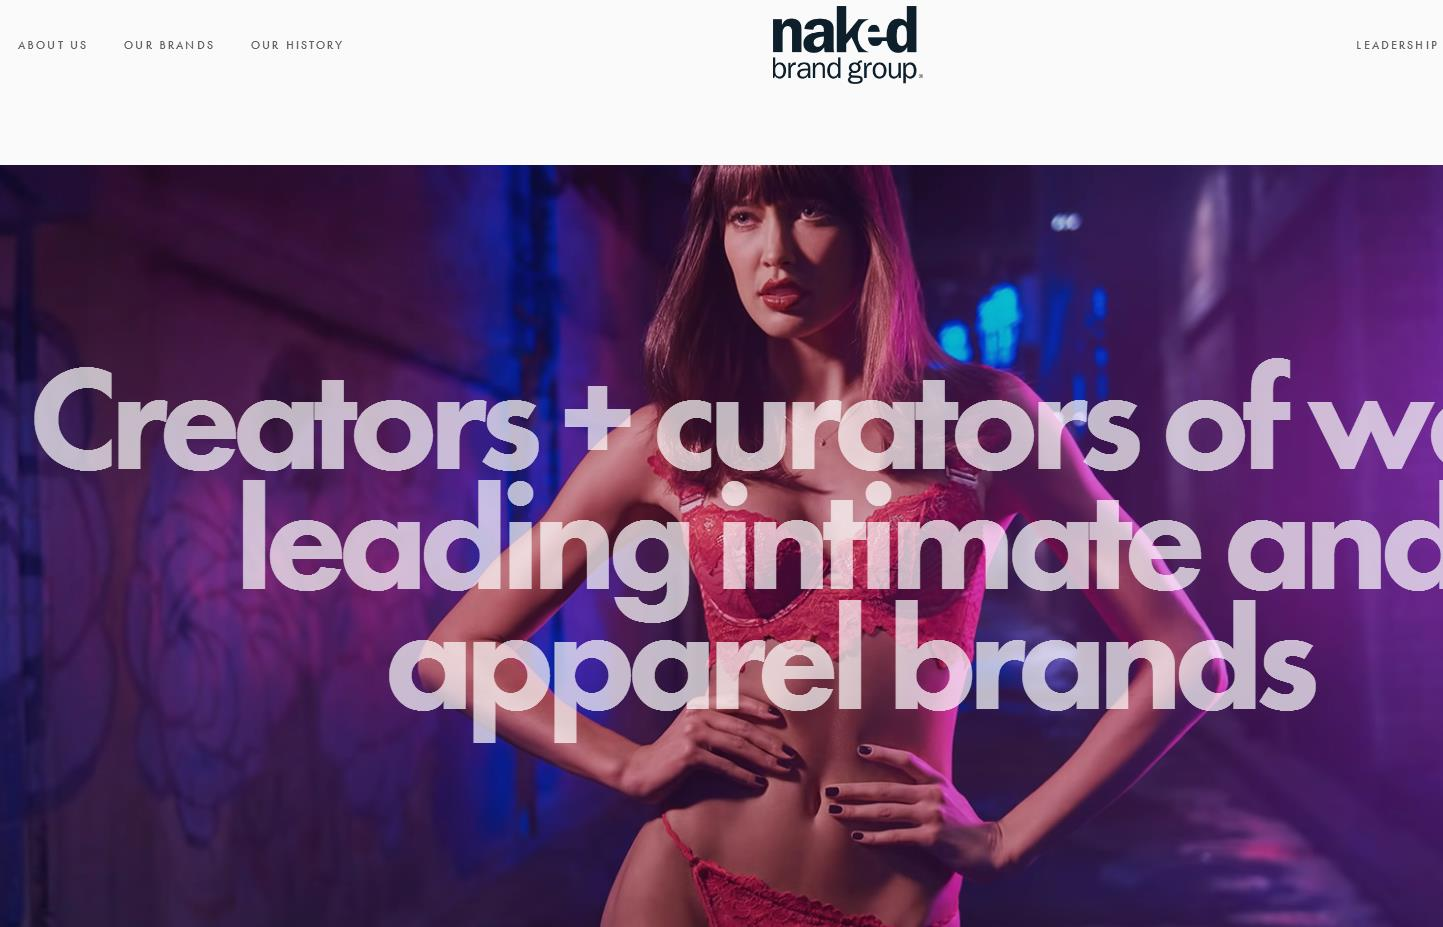 La Perla 的新东家、荷兰私募基金 Sapinda 2500万美元投资纽约内衣时尚和生活方式集团 Naked